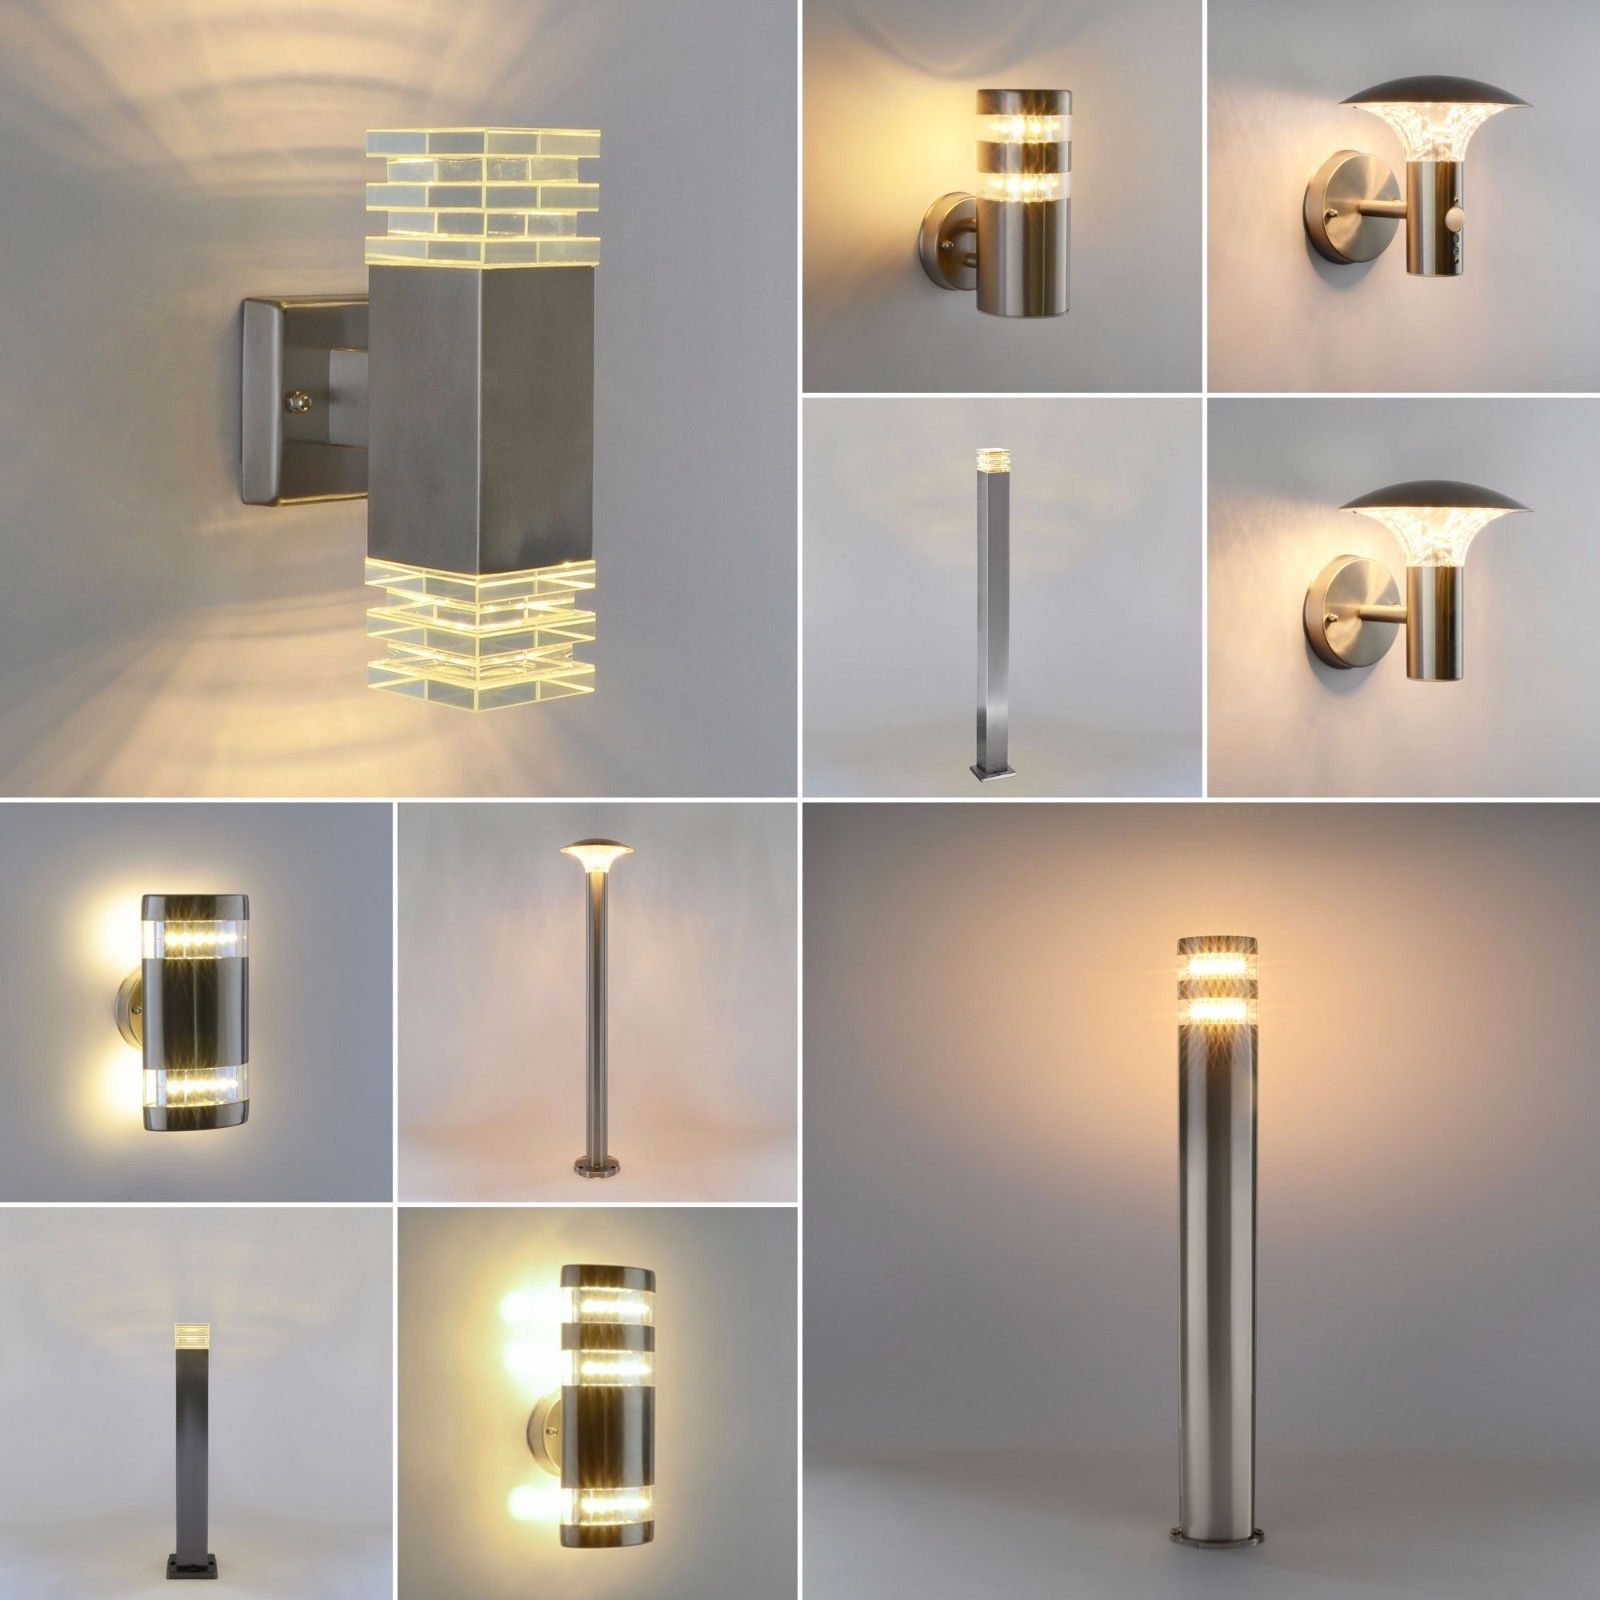 details zu led aussenleuchte wandleuchte bewegungsmelder wandlampe standleuchte wegeleuchte. Black Bedroom Furniture Sets. Home Design Ideas